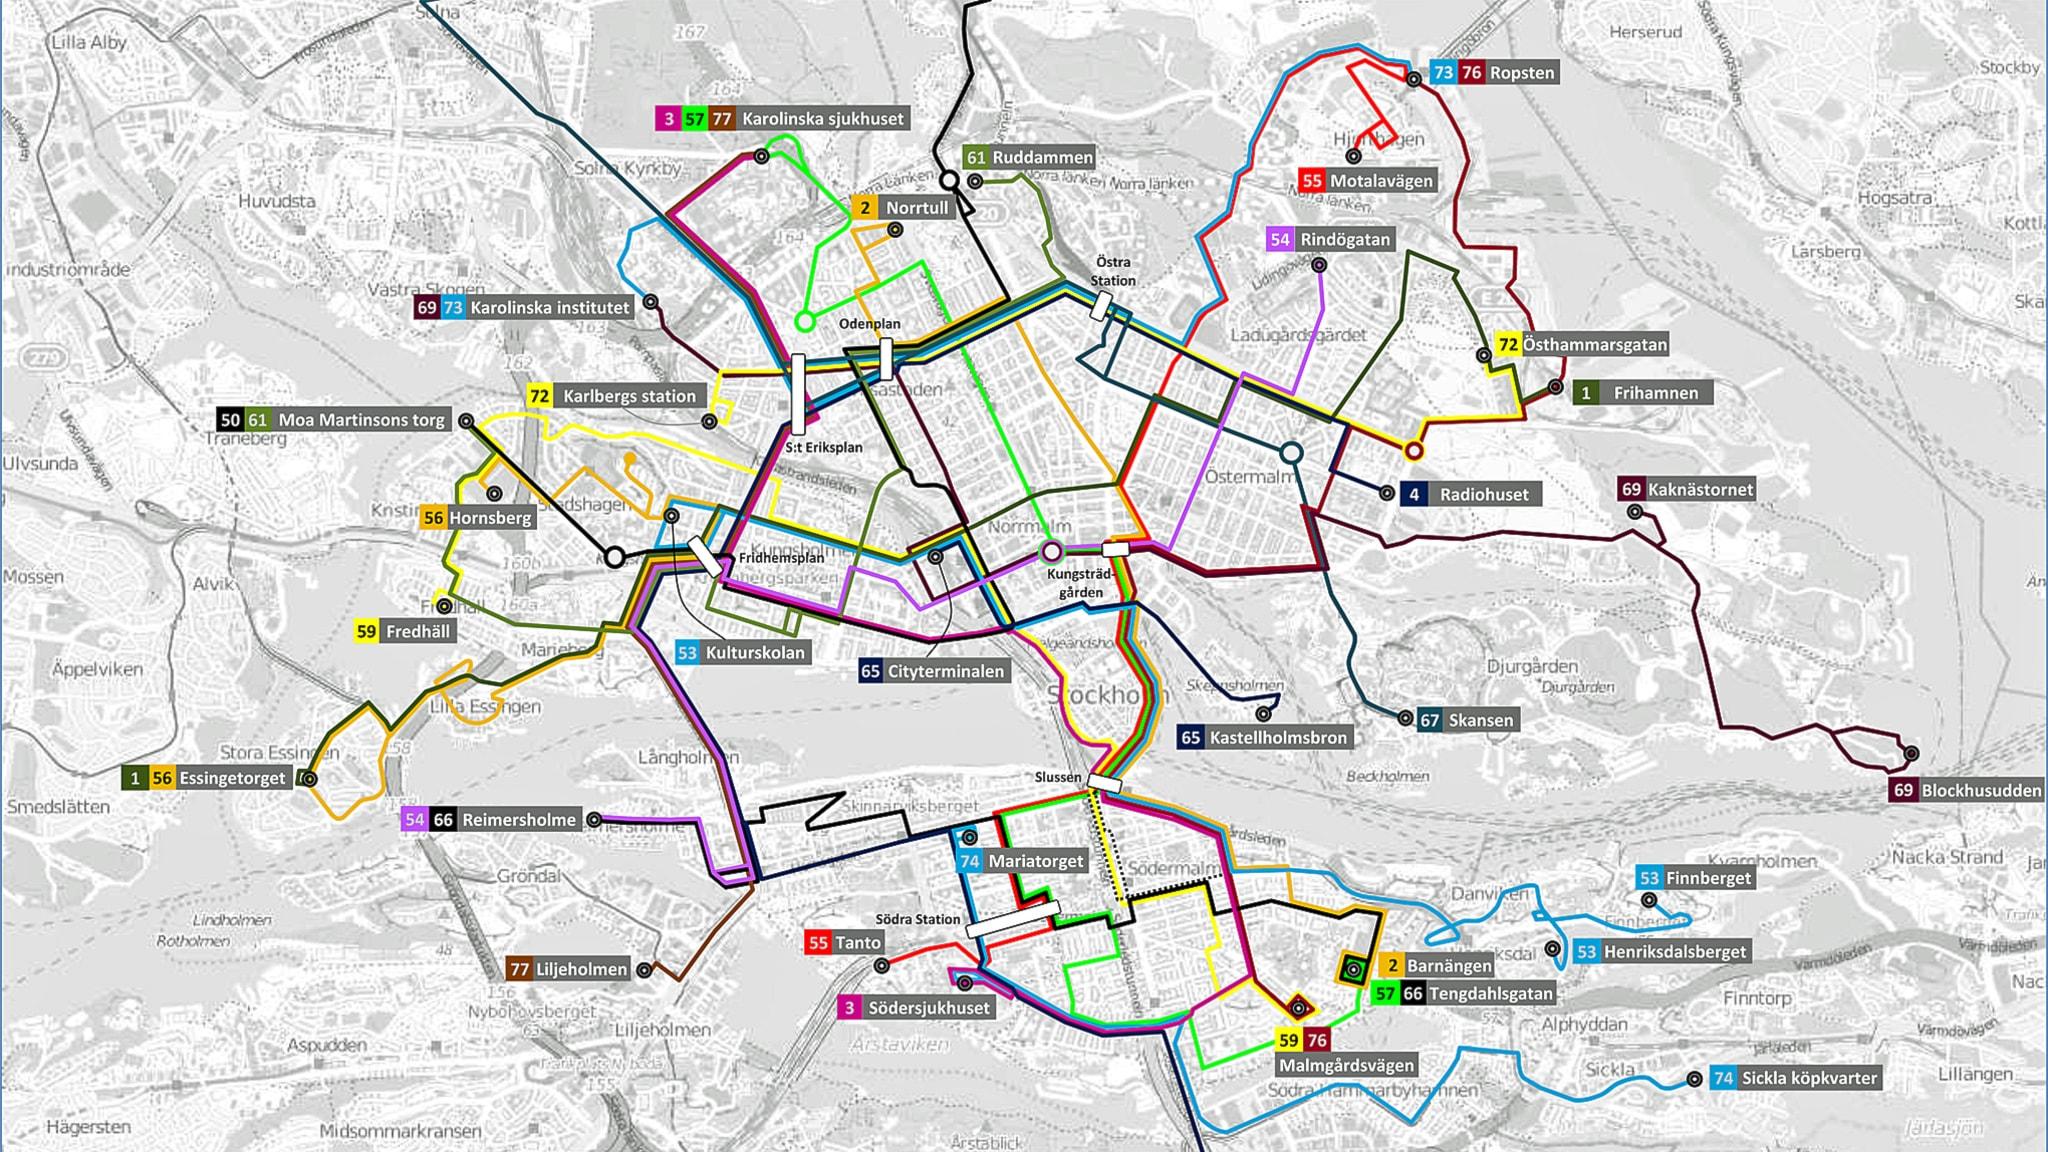 Stor Omlaggning For Bussar I Innerstaden P4 Stockholm Sveriges